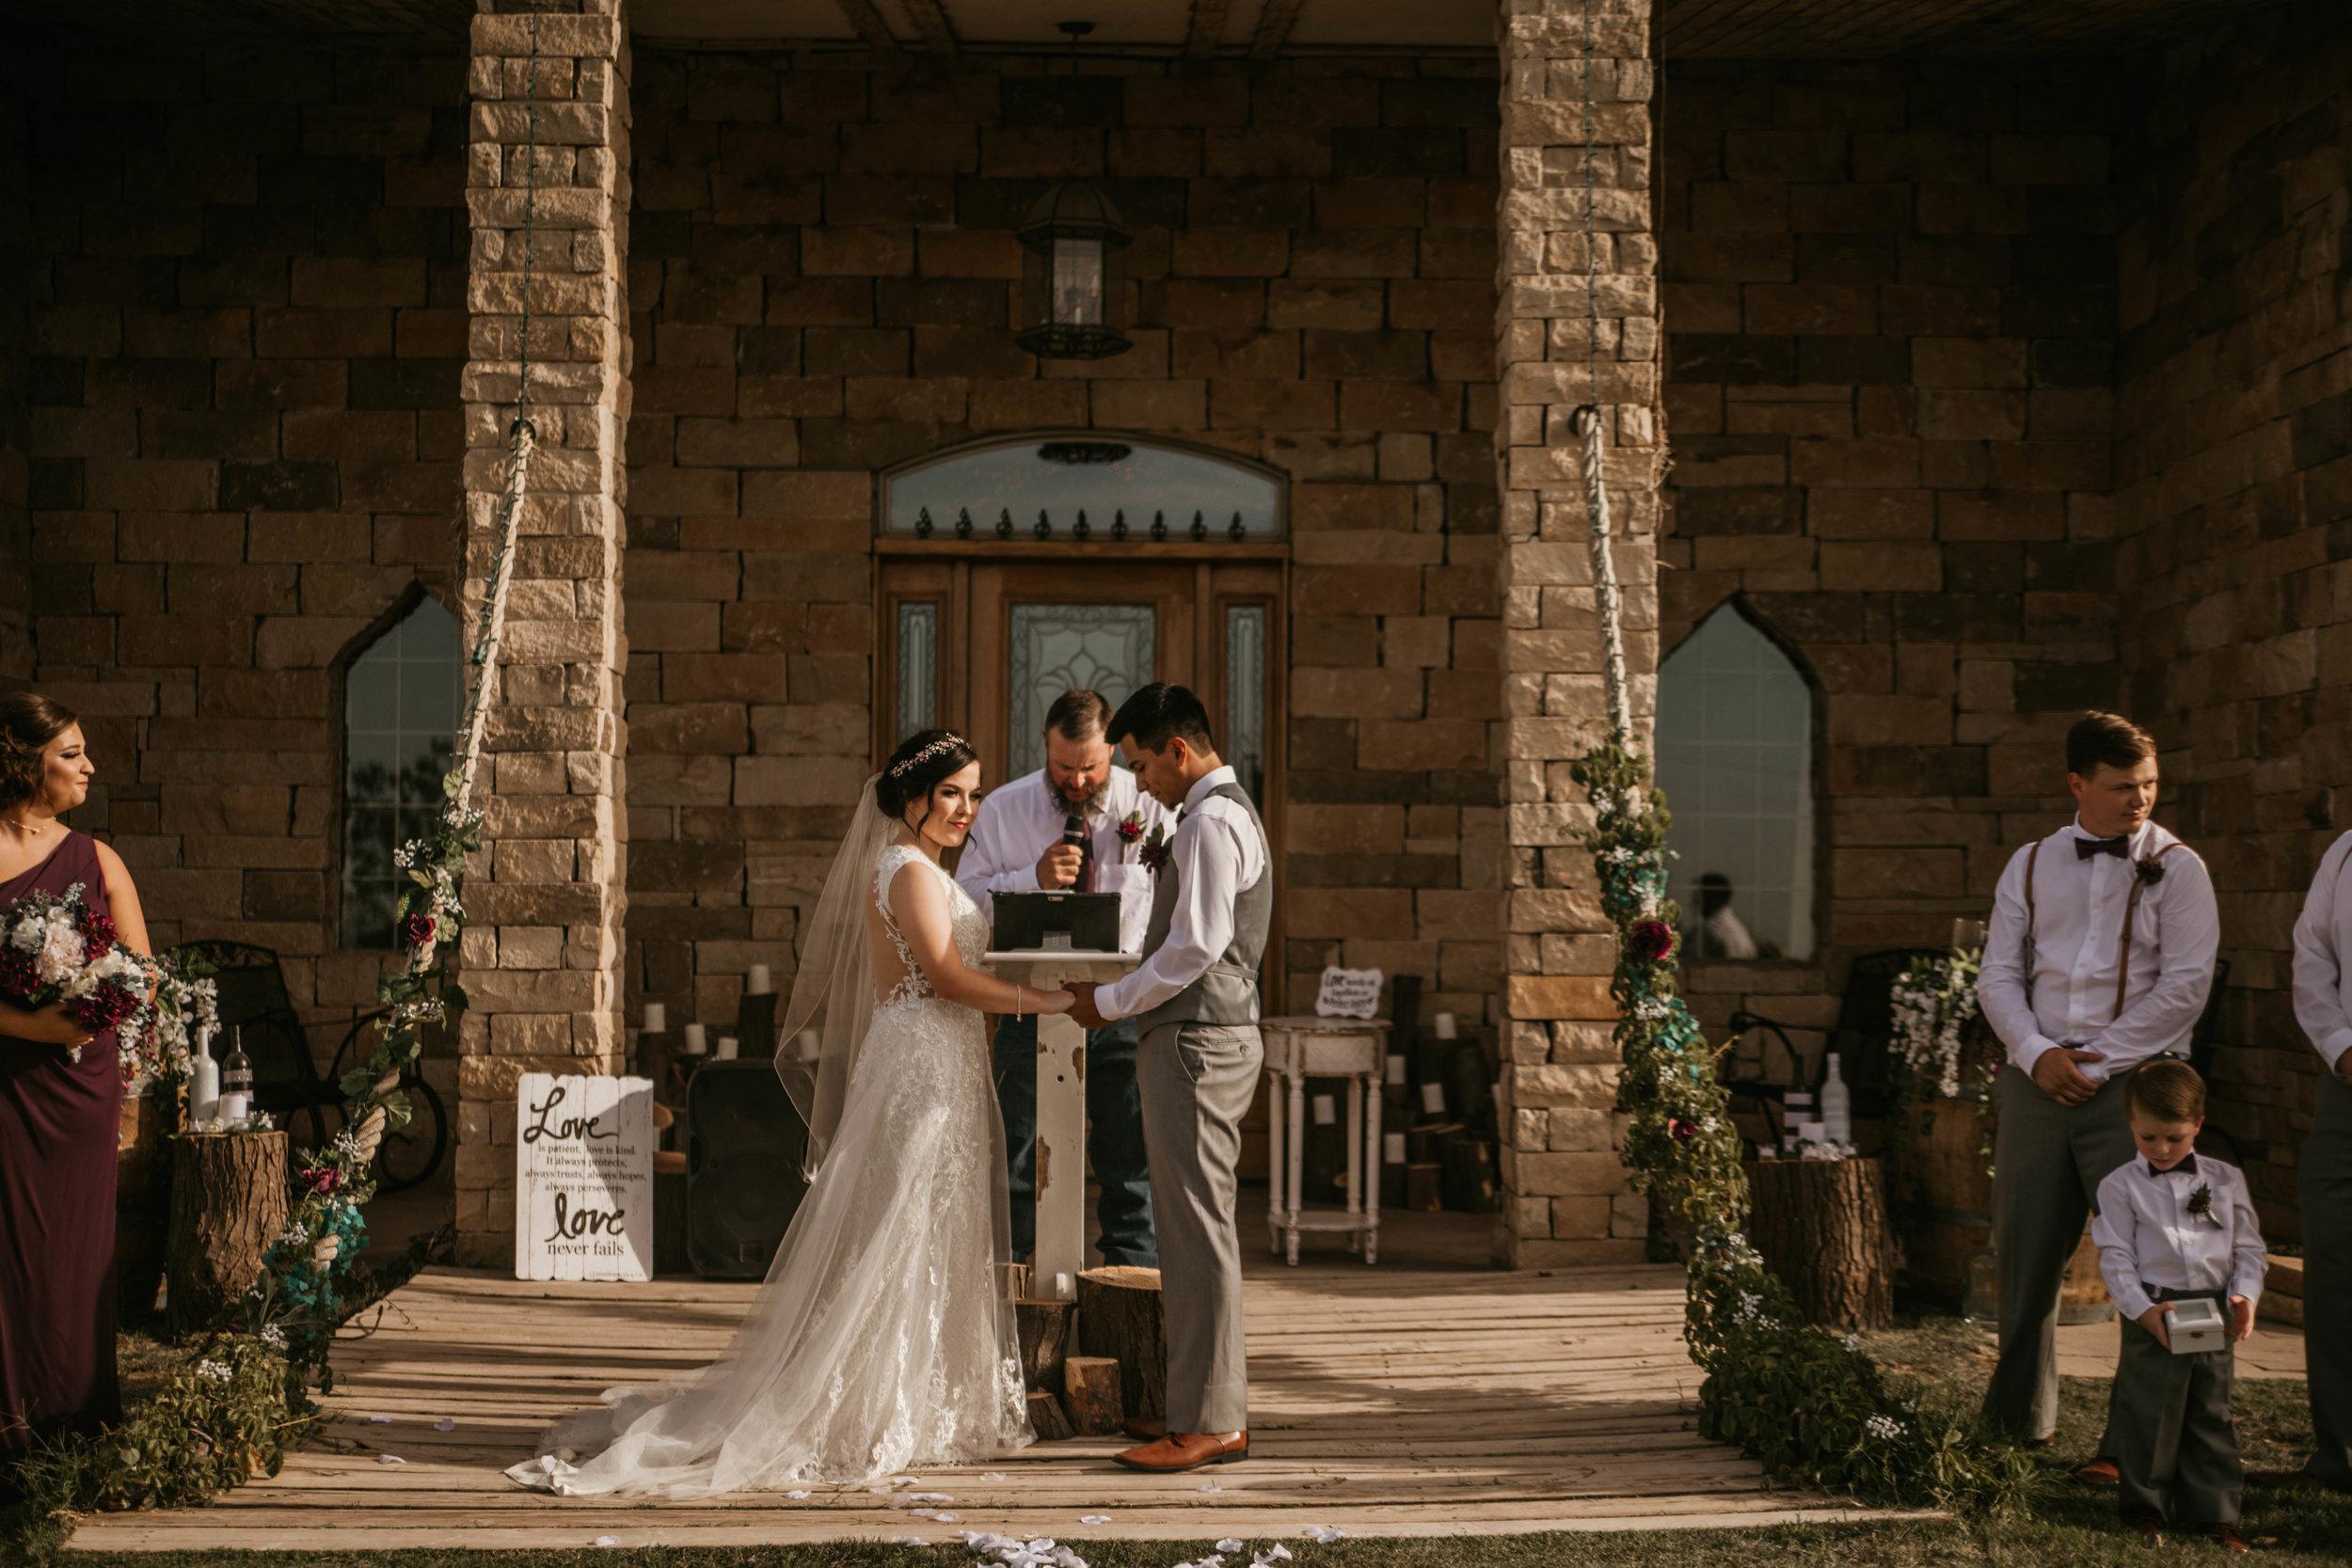 Lubbock,Texas WeddingDM7A1072.jpg